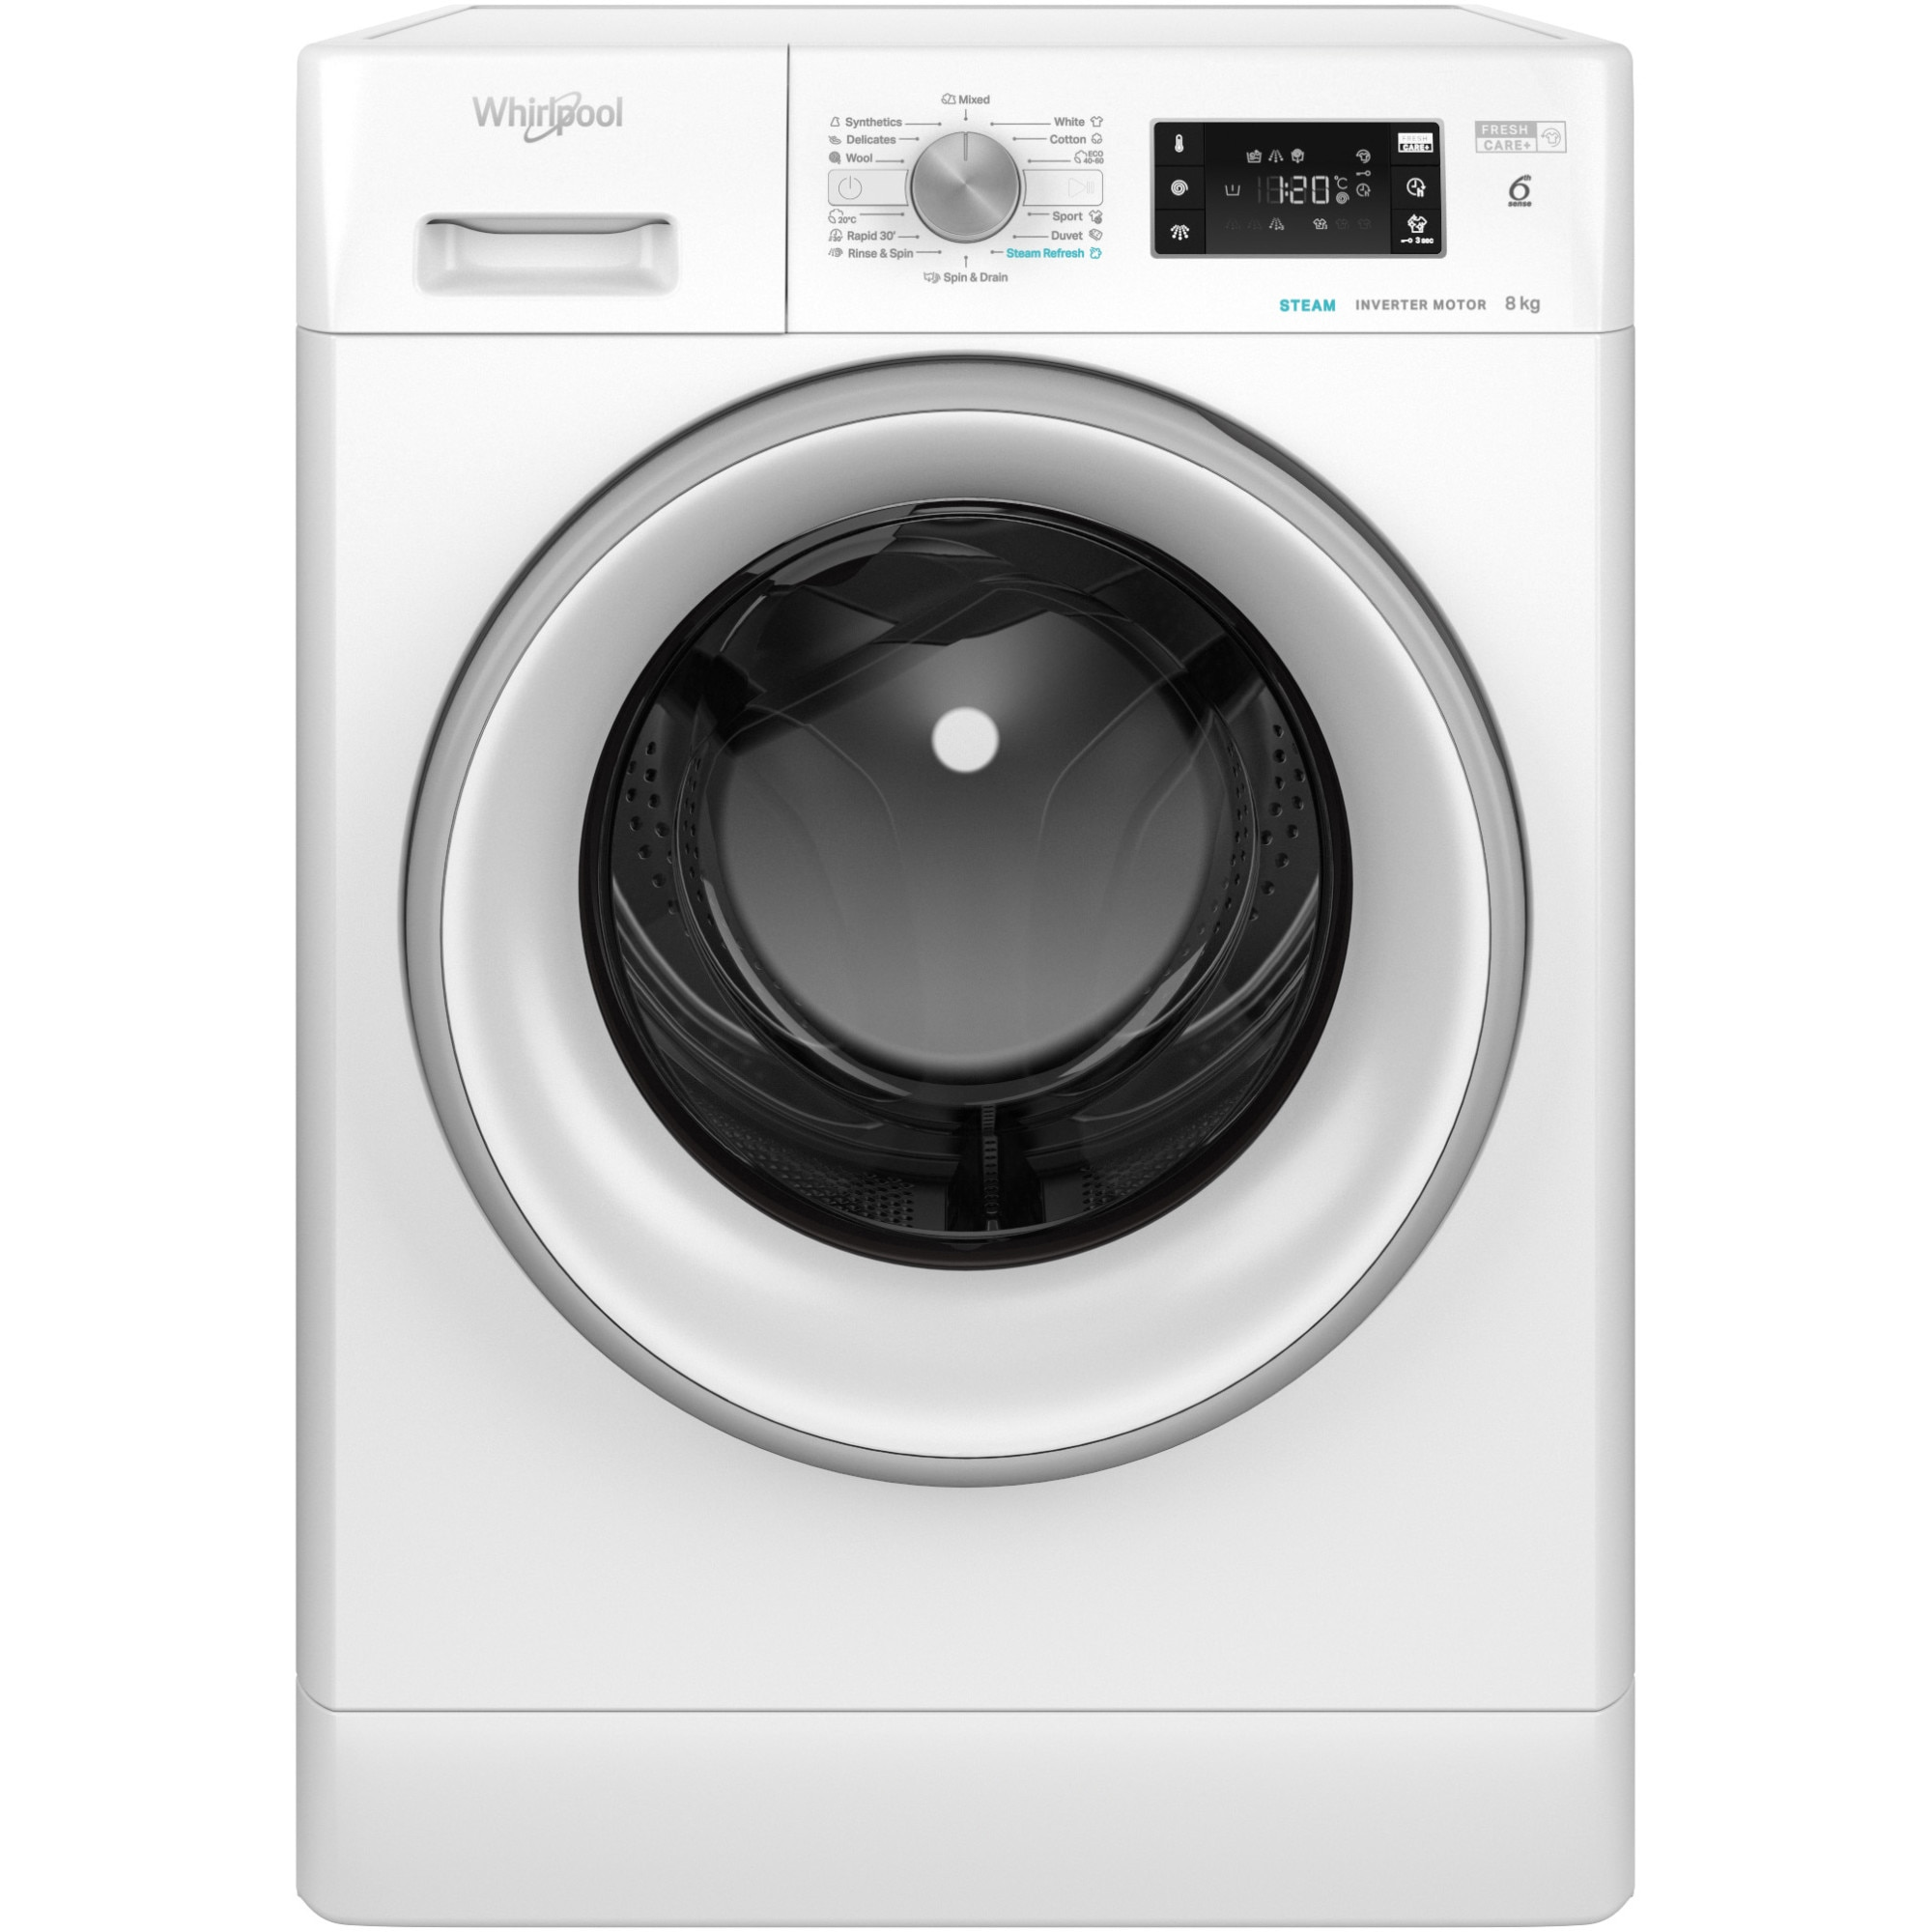 Fotografie Masina de spalat rufe Whirlpool FreshCare+ FFB8248SVEE, 8 kg, 1200 rpm, Clasa A+++, Steam Refresh, Tehnologia al-6lea Simt, Motor Inverter, Alb